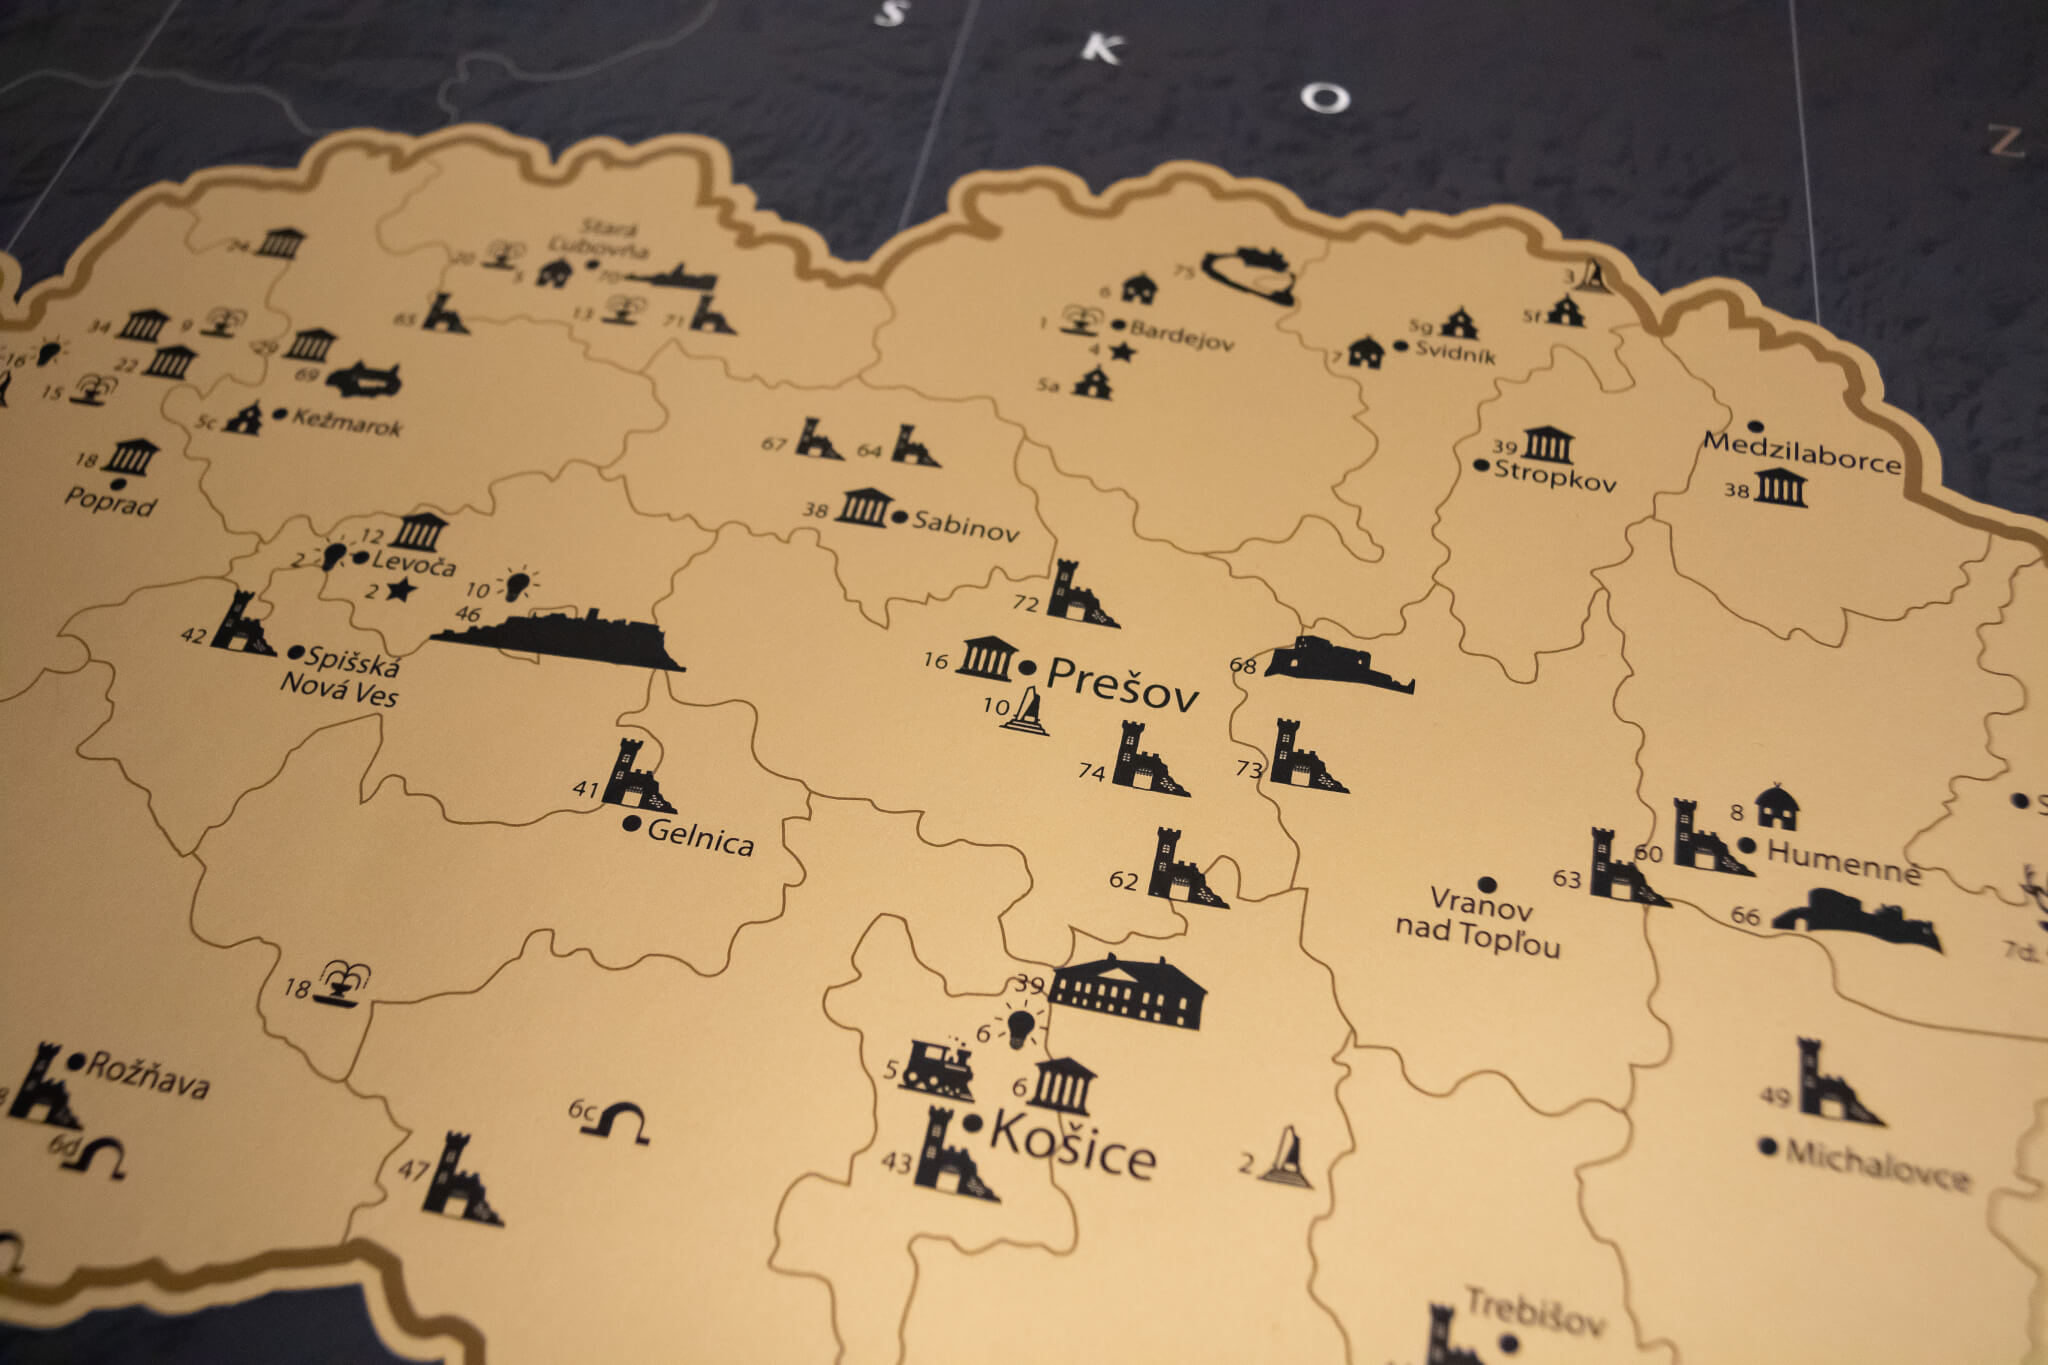 Mapa para raspar de Eslovaquia - Detalle del mapa